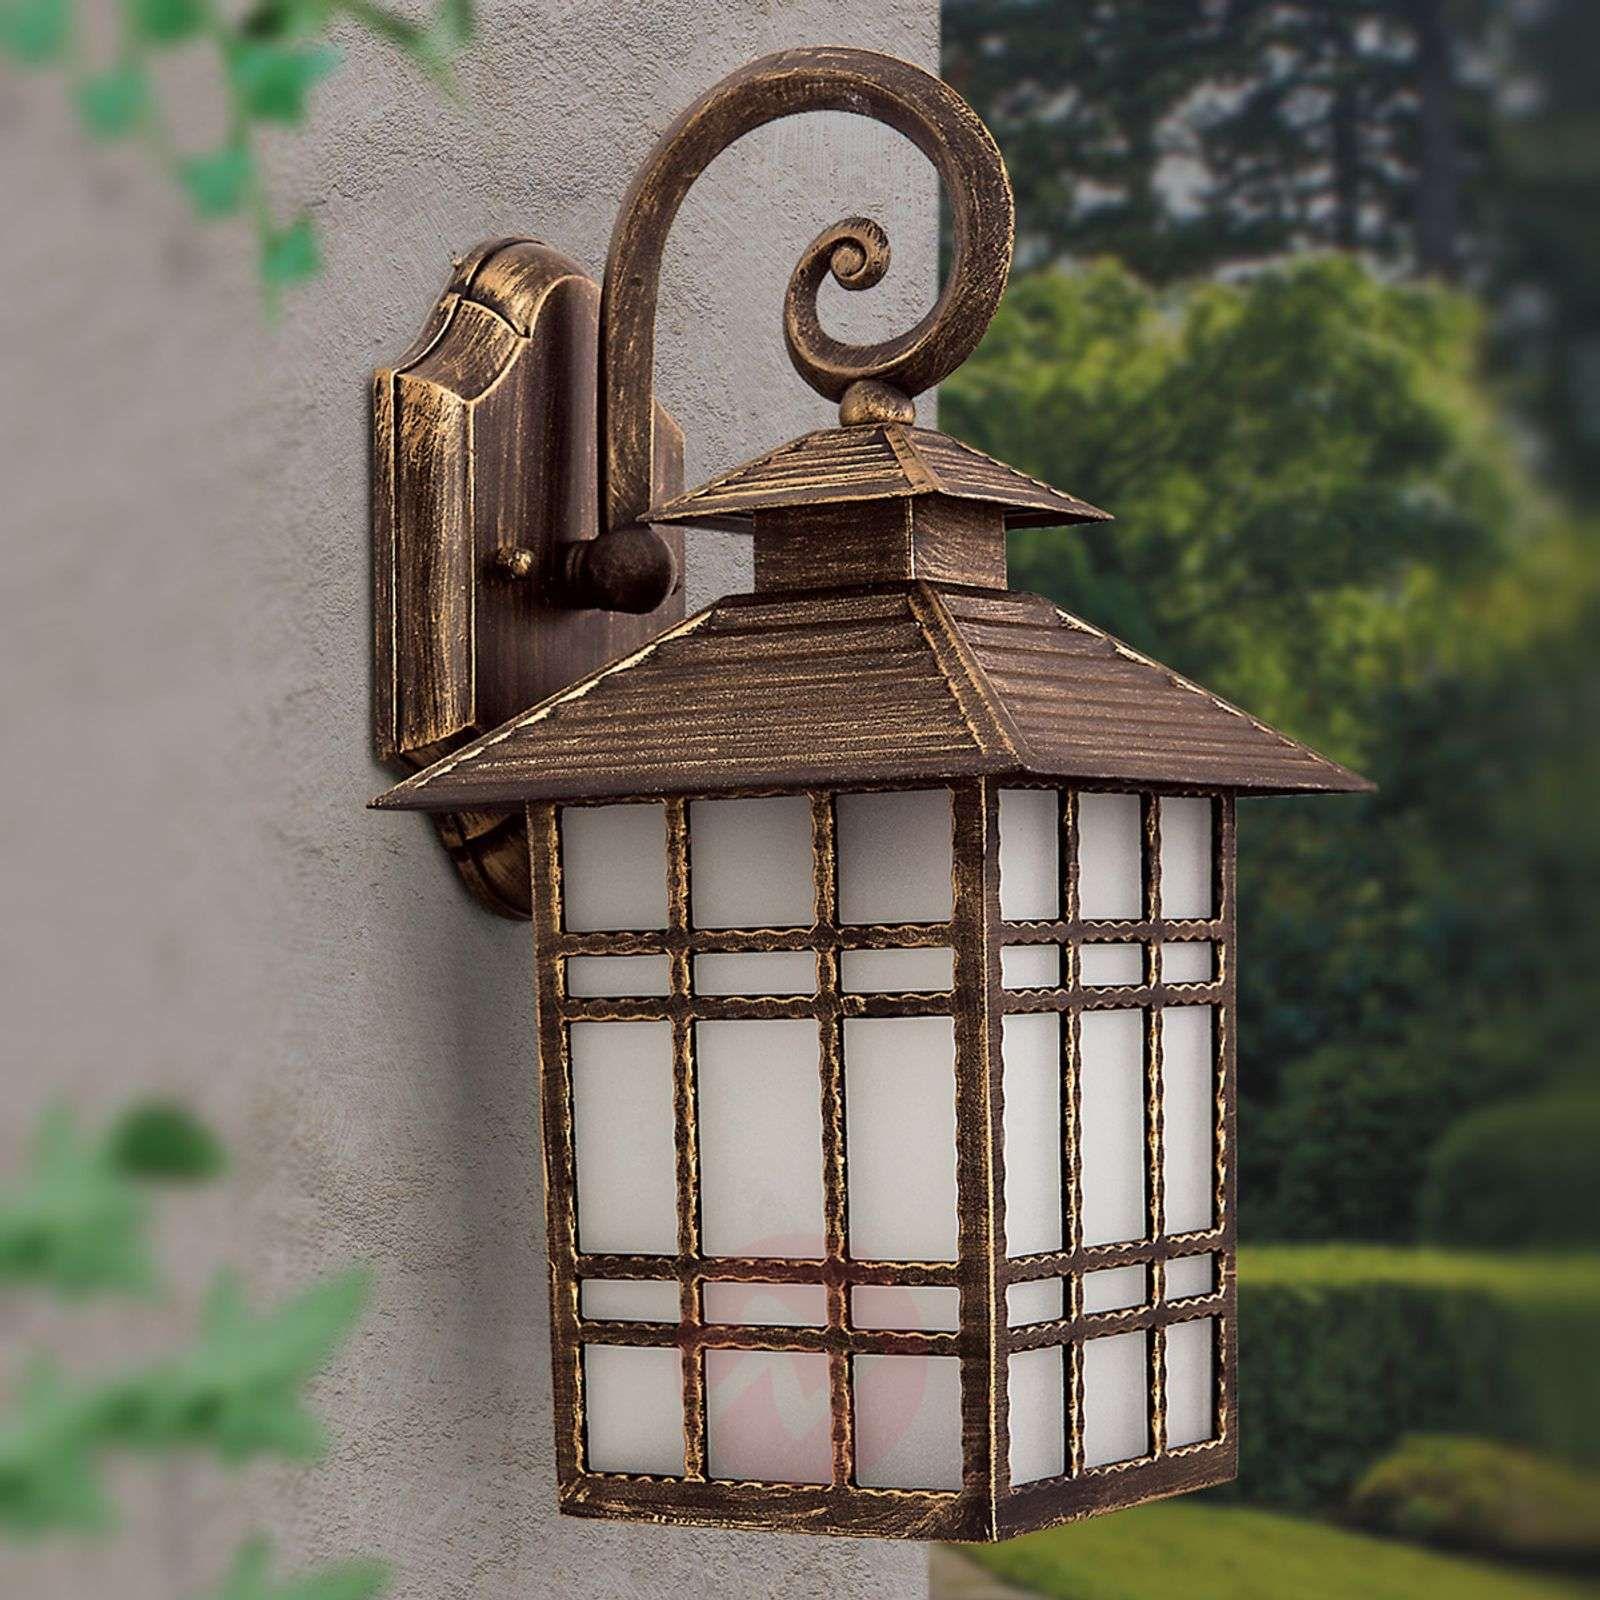 Tradycyjna Zewnetrzna Lampa Scienna Ilka Paredes Iluminadas Pared Exterior Faroles